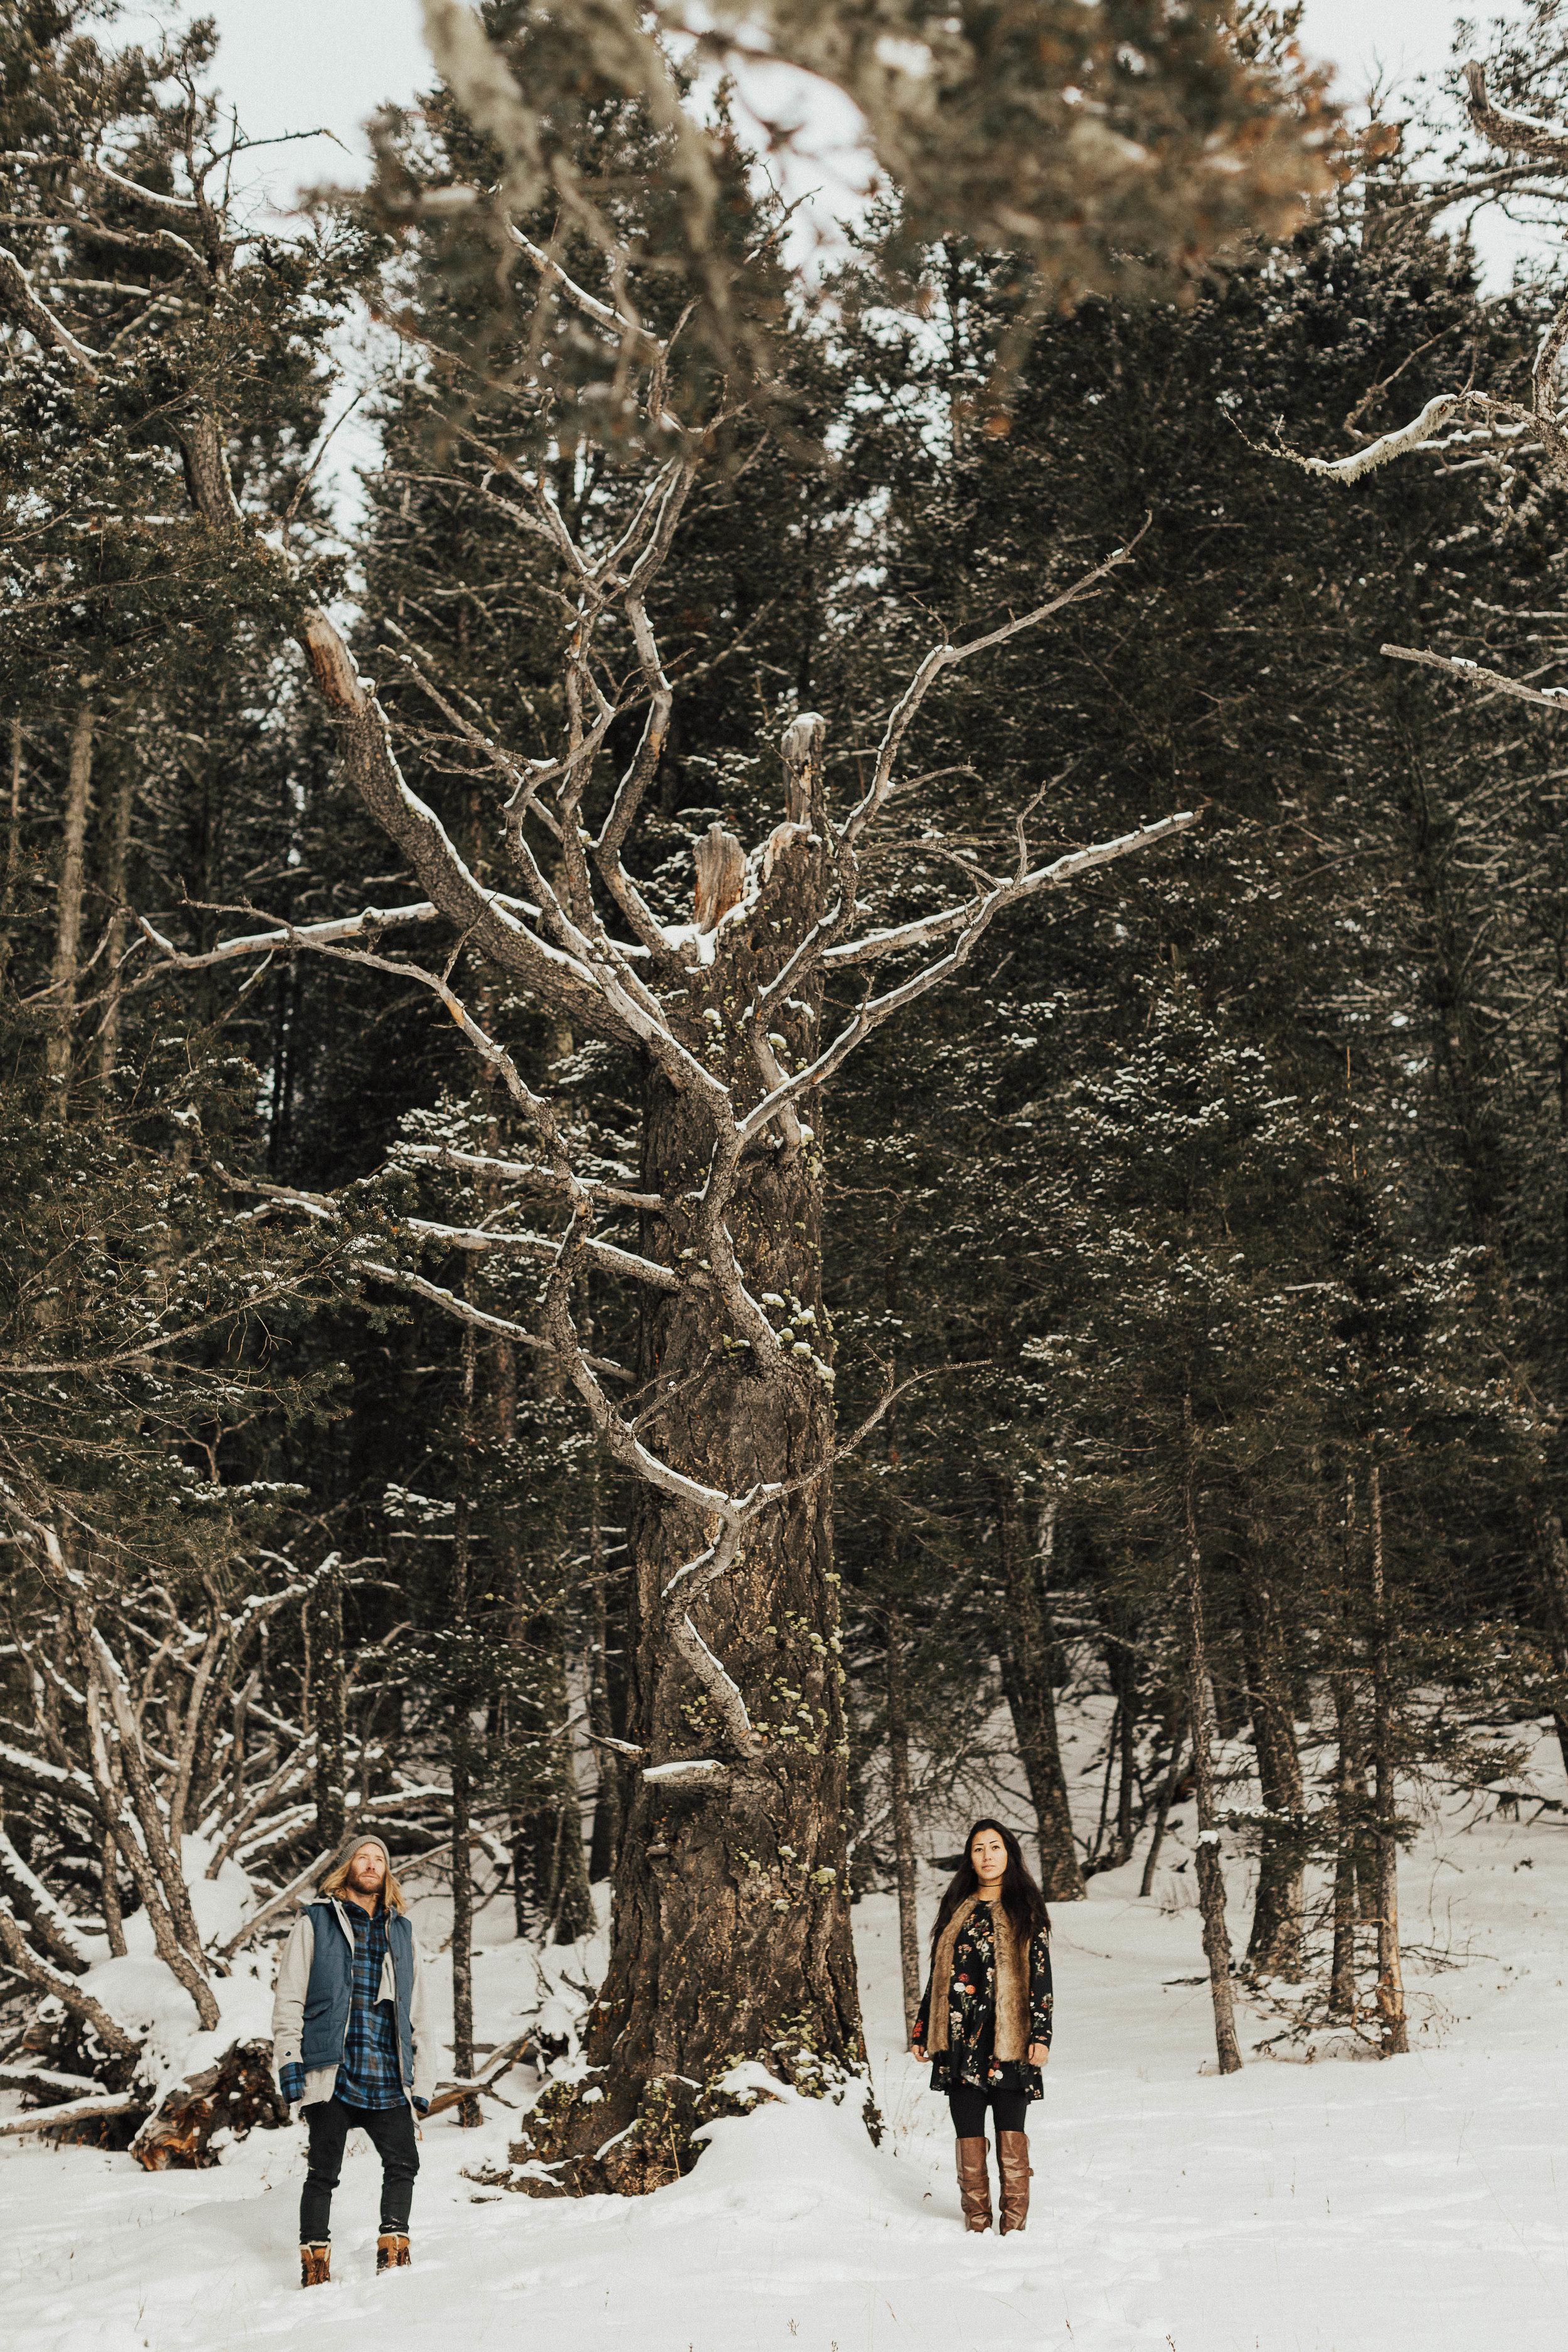 Banff Engagement Photographer - Winter Mountain Adventure Engagement Session - Michelle Larmand Photography-078